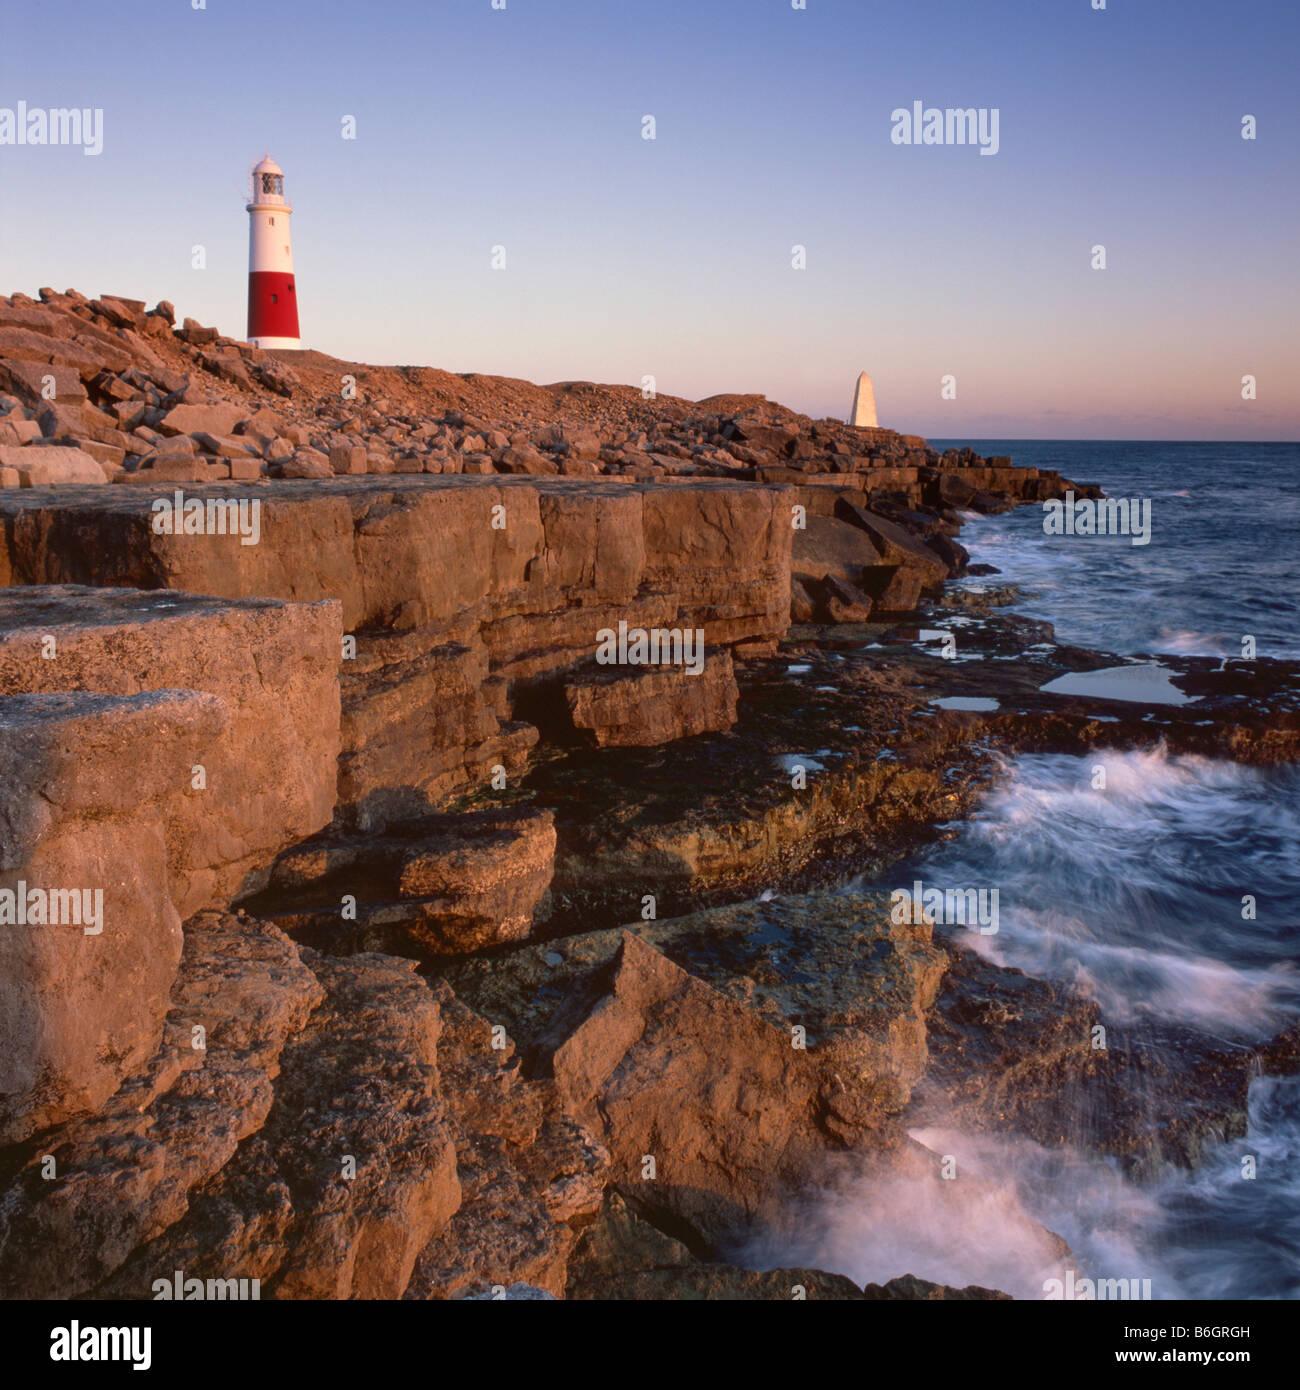 Lighthouse at Portland Bill, Isle of Portland, Dorset, England - Stock Image